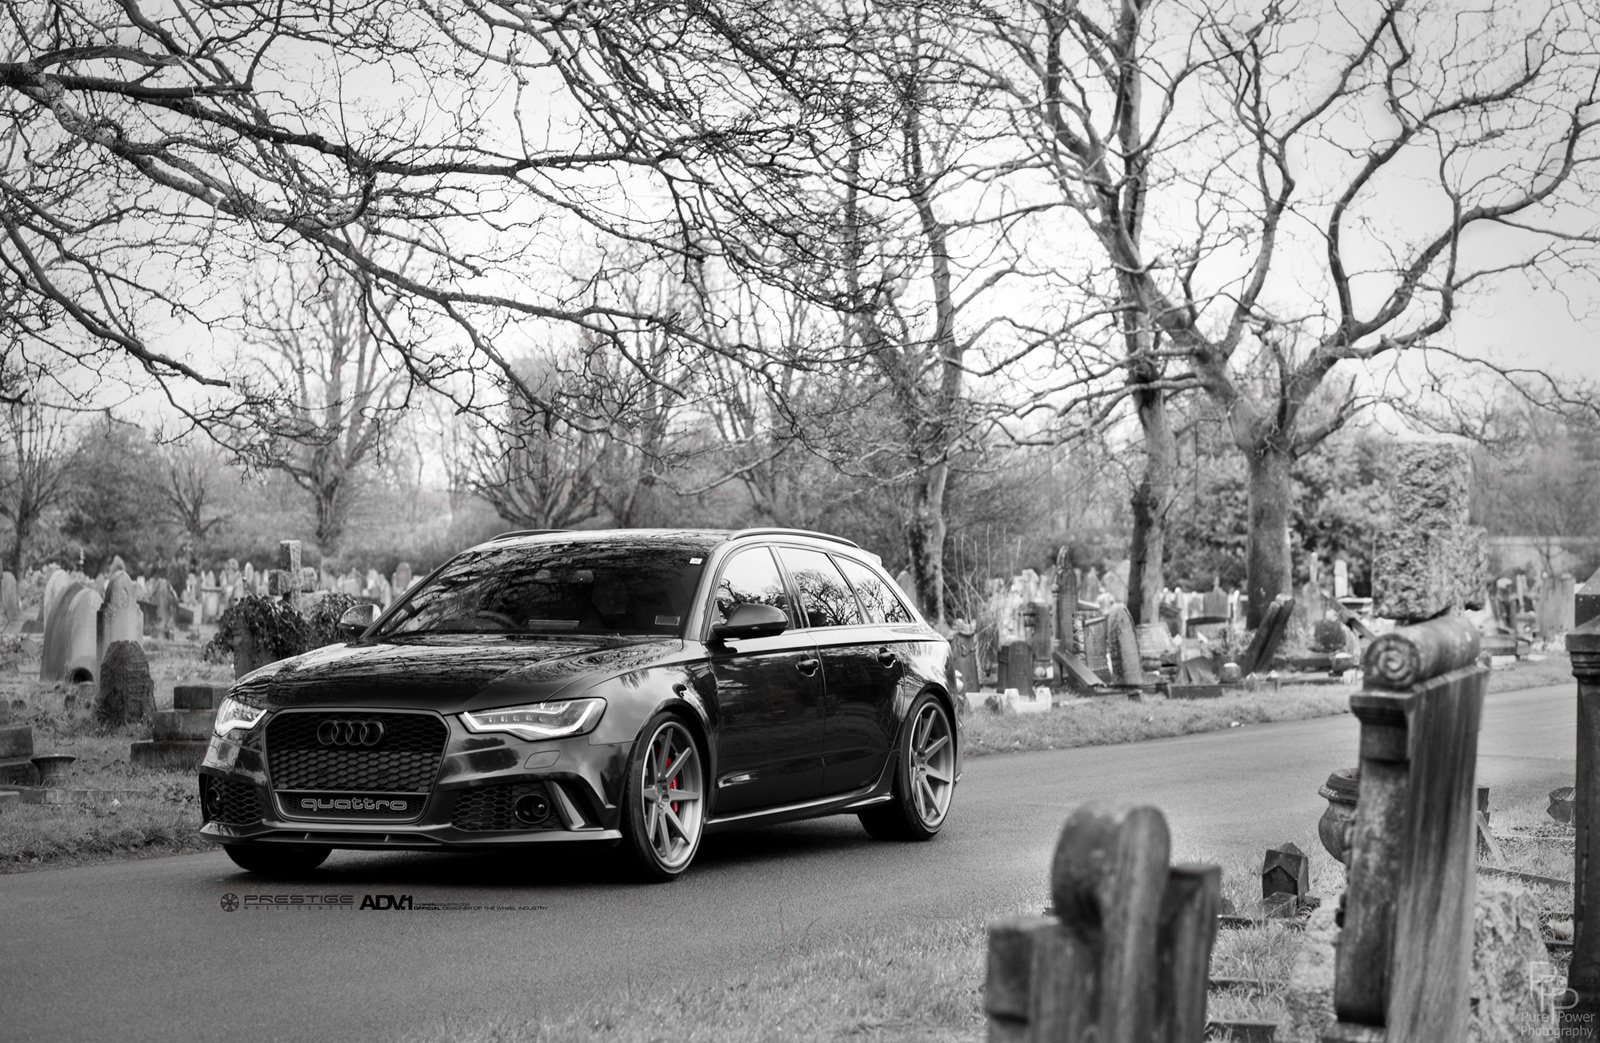 2015 Cars Adv1 Wagon Tuning Wheels Audi Rs6 Avant